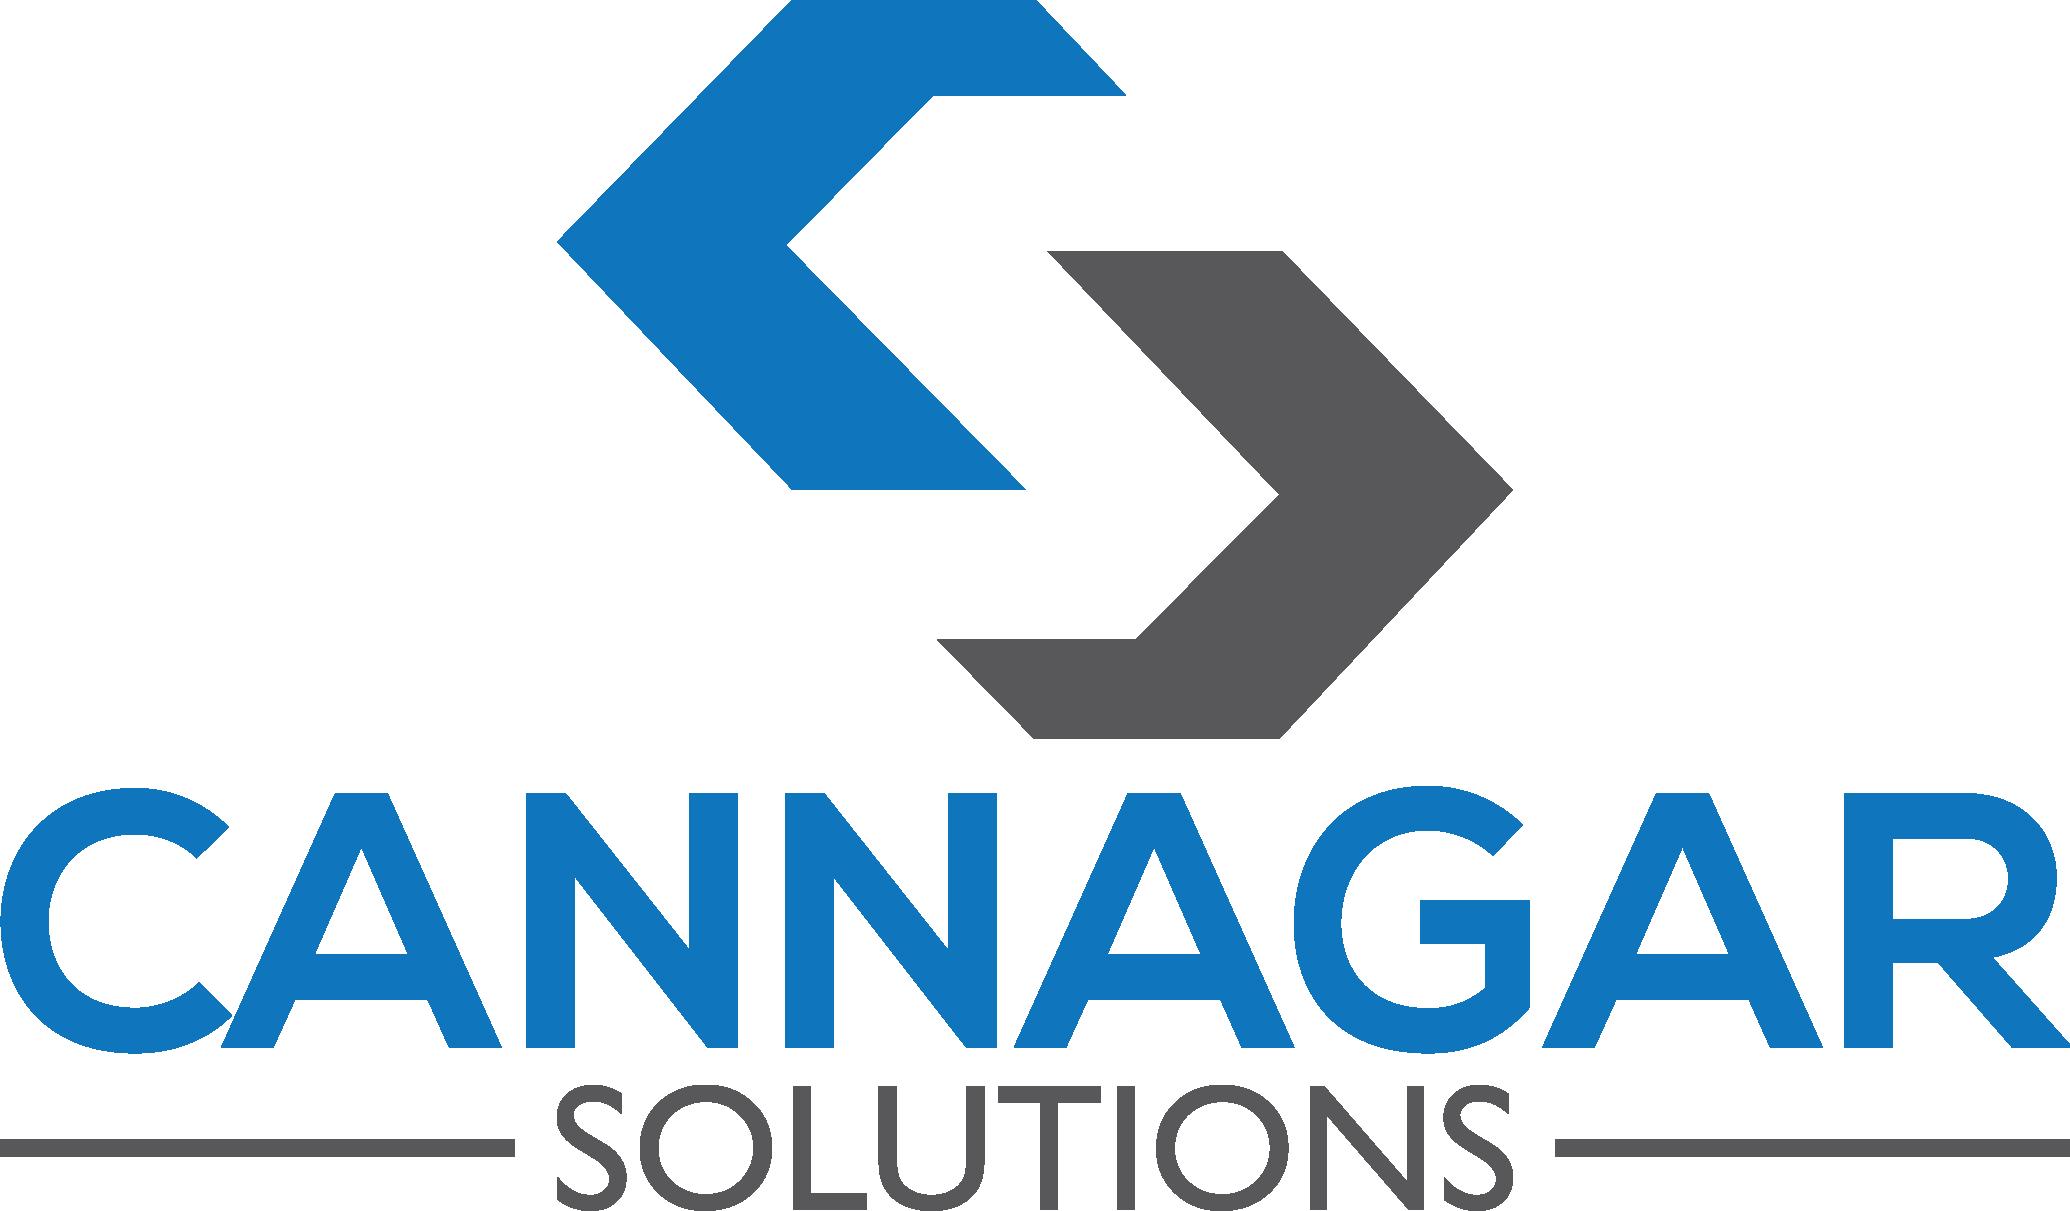 Cannagar Solutions